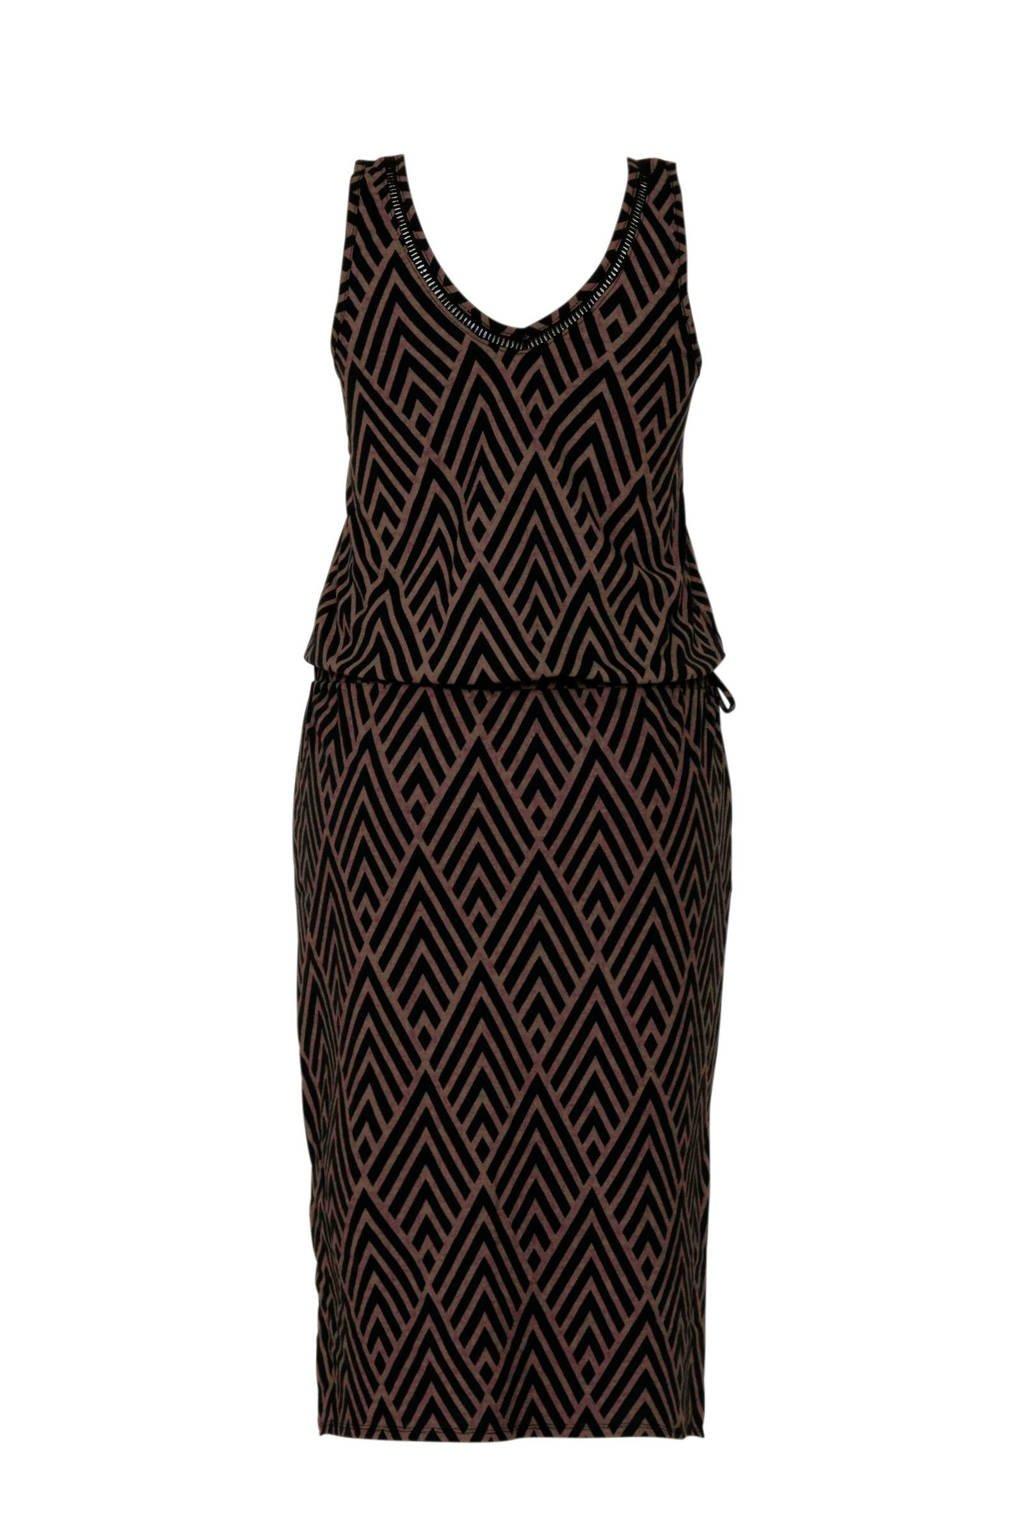 whkmp's beachwave jersey jurk met kant zwart/bruin, Zwart/bruin